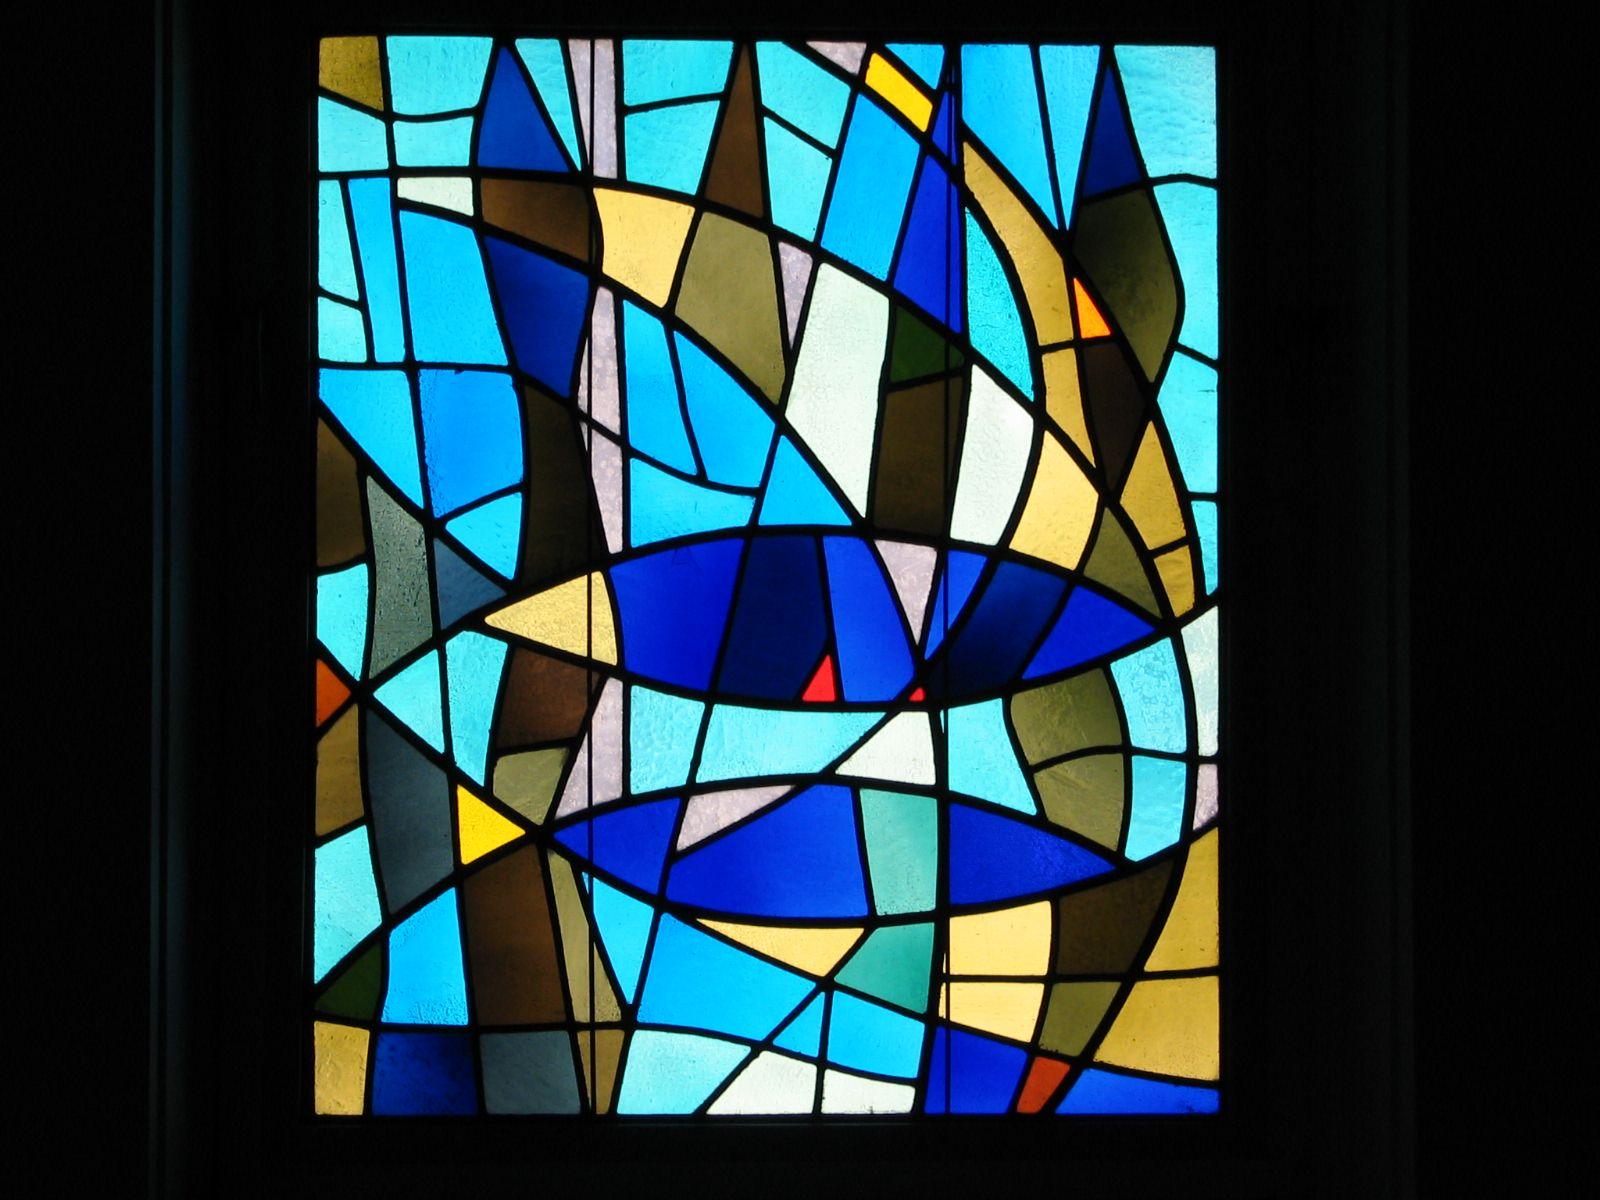 poisson pour vitrail recherche google artisans du vitrail pinterest artisan. Black Bedroom Furniture Sets. Home Design Ideas